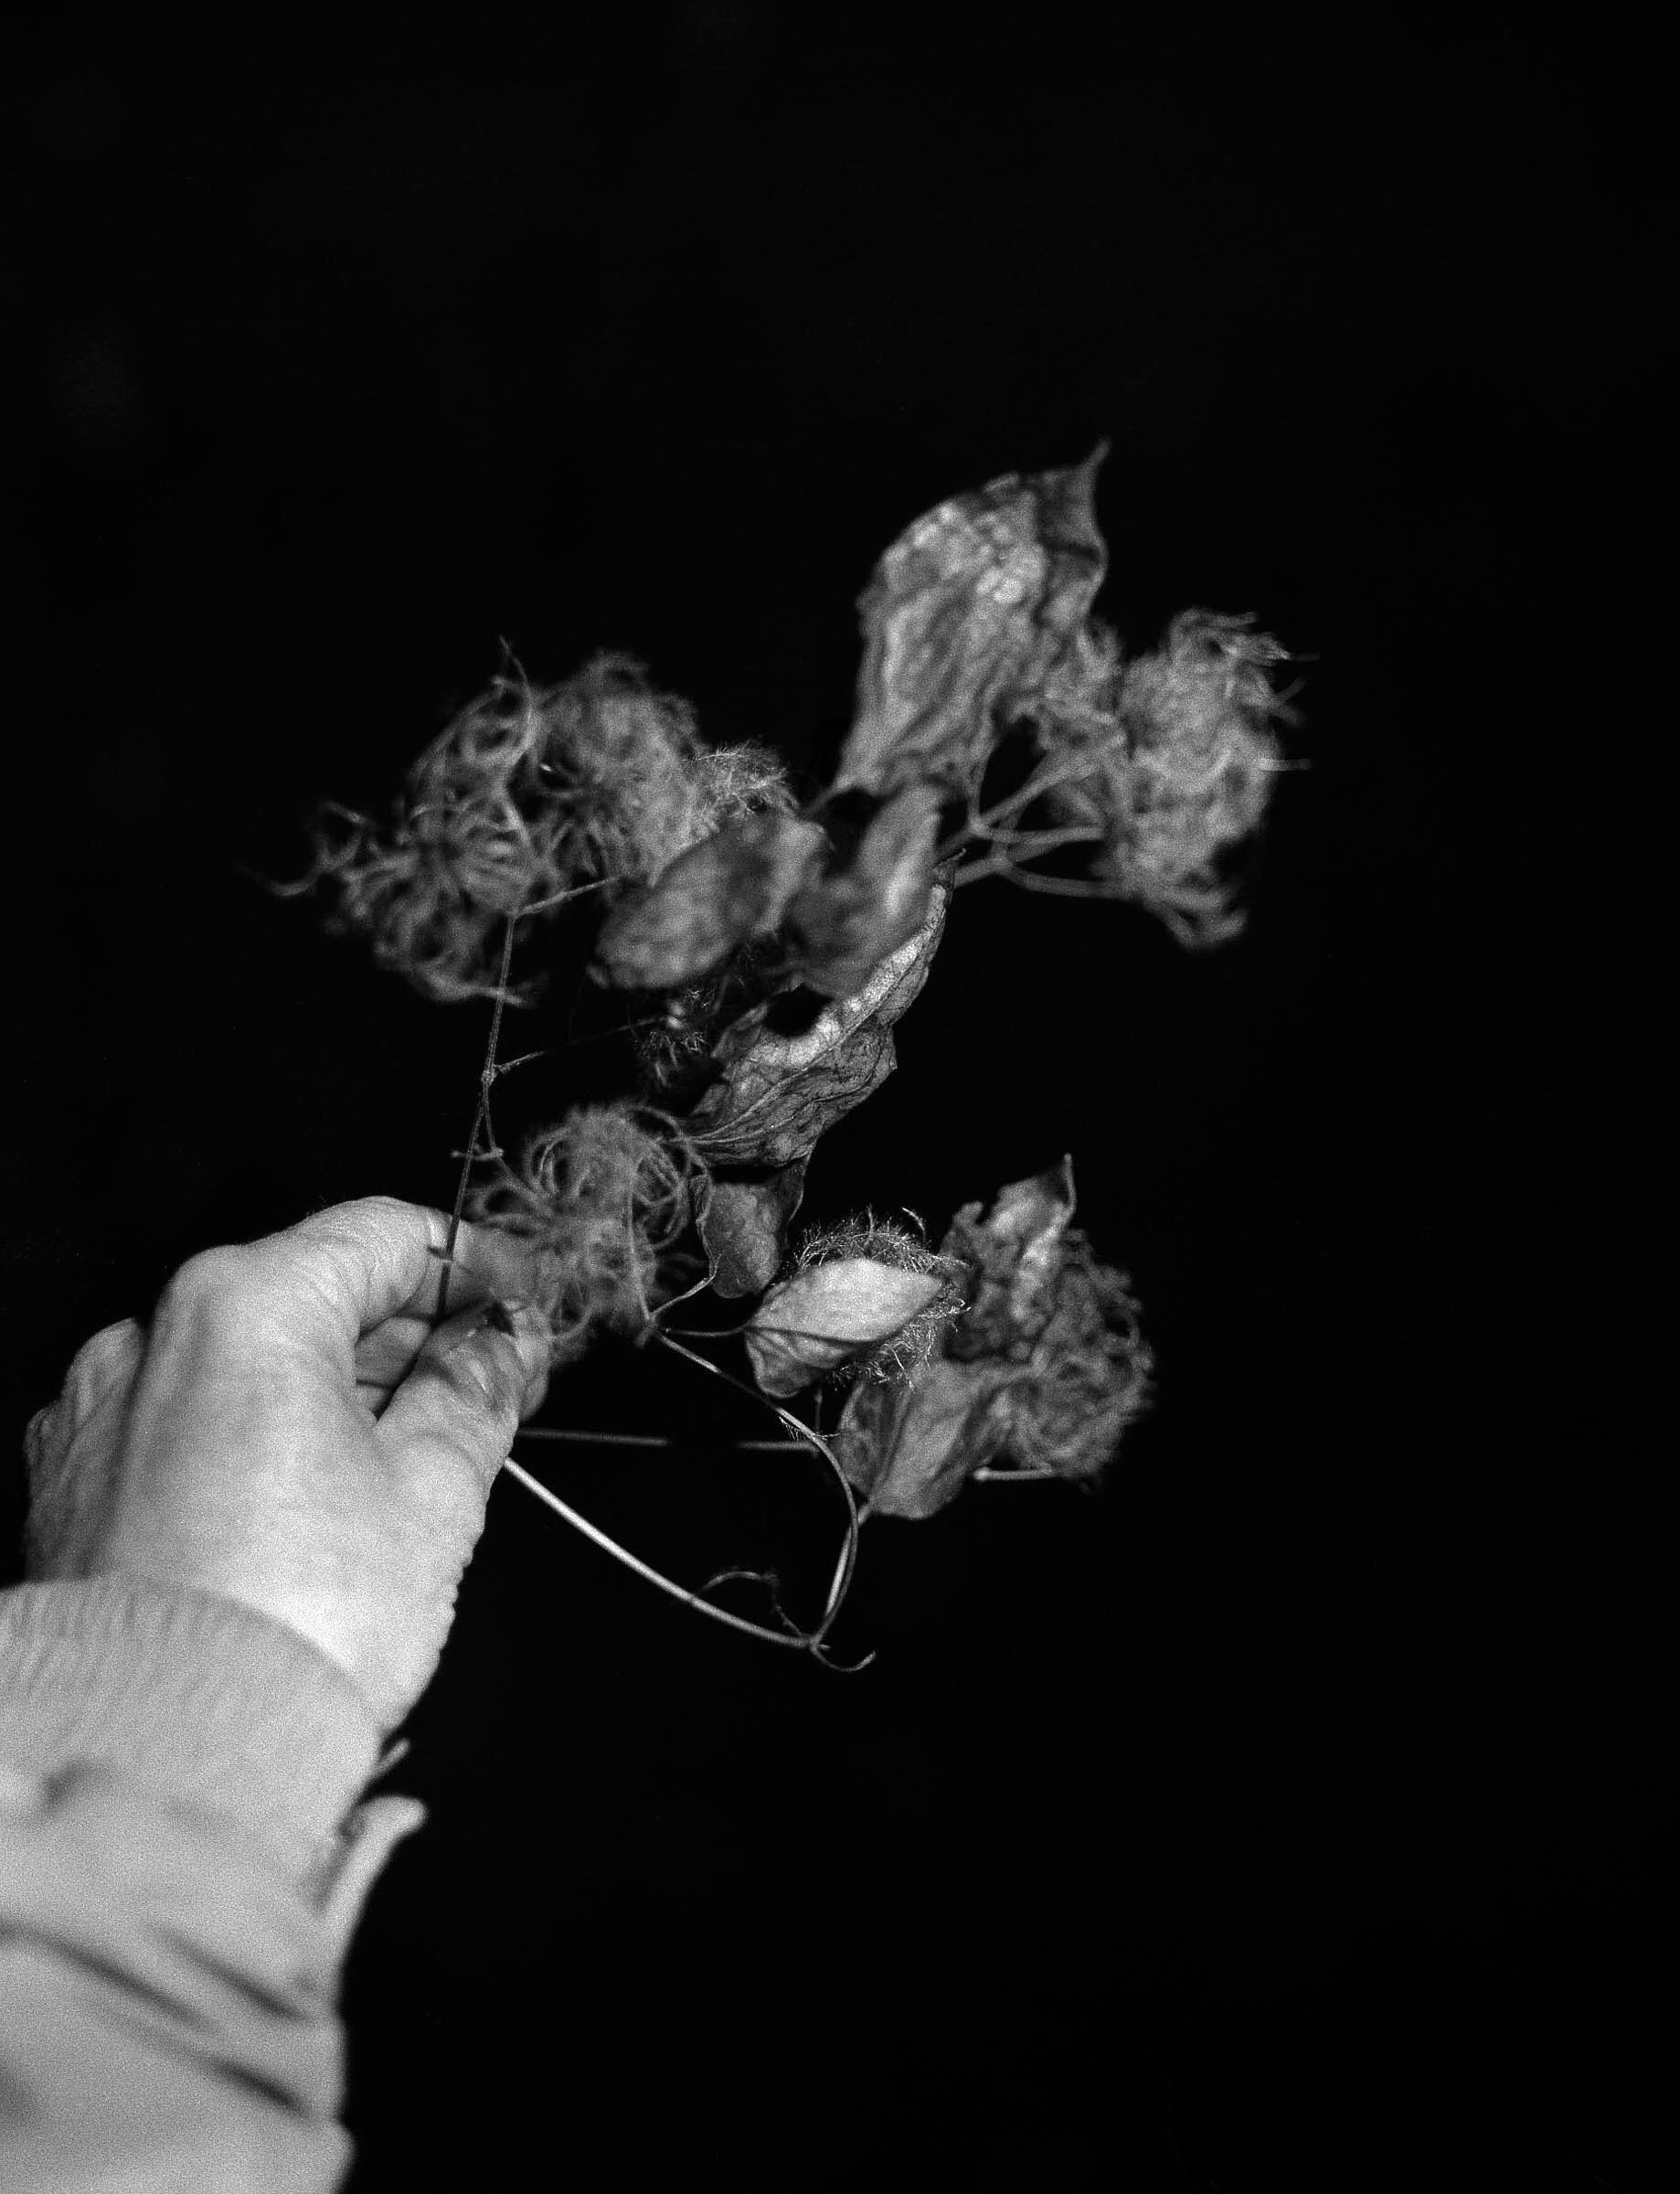 Rosie Dale - Runaways women holding plants in her hands